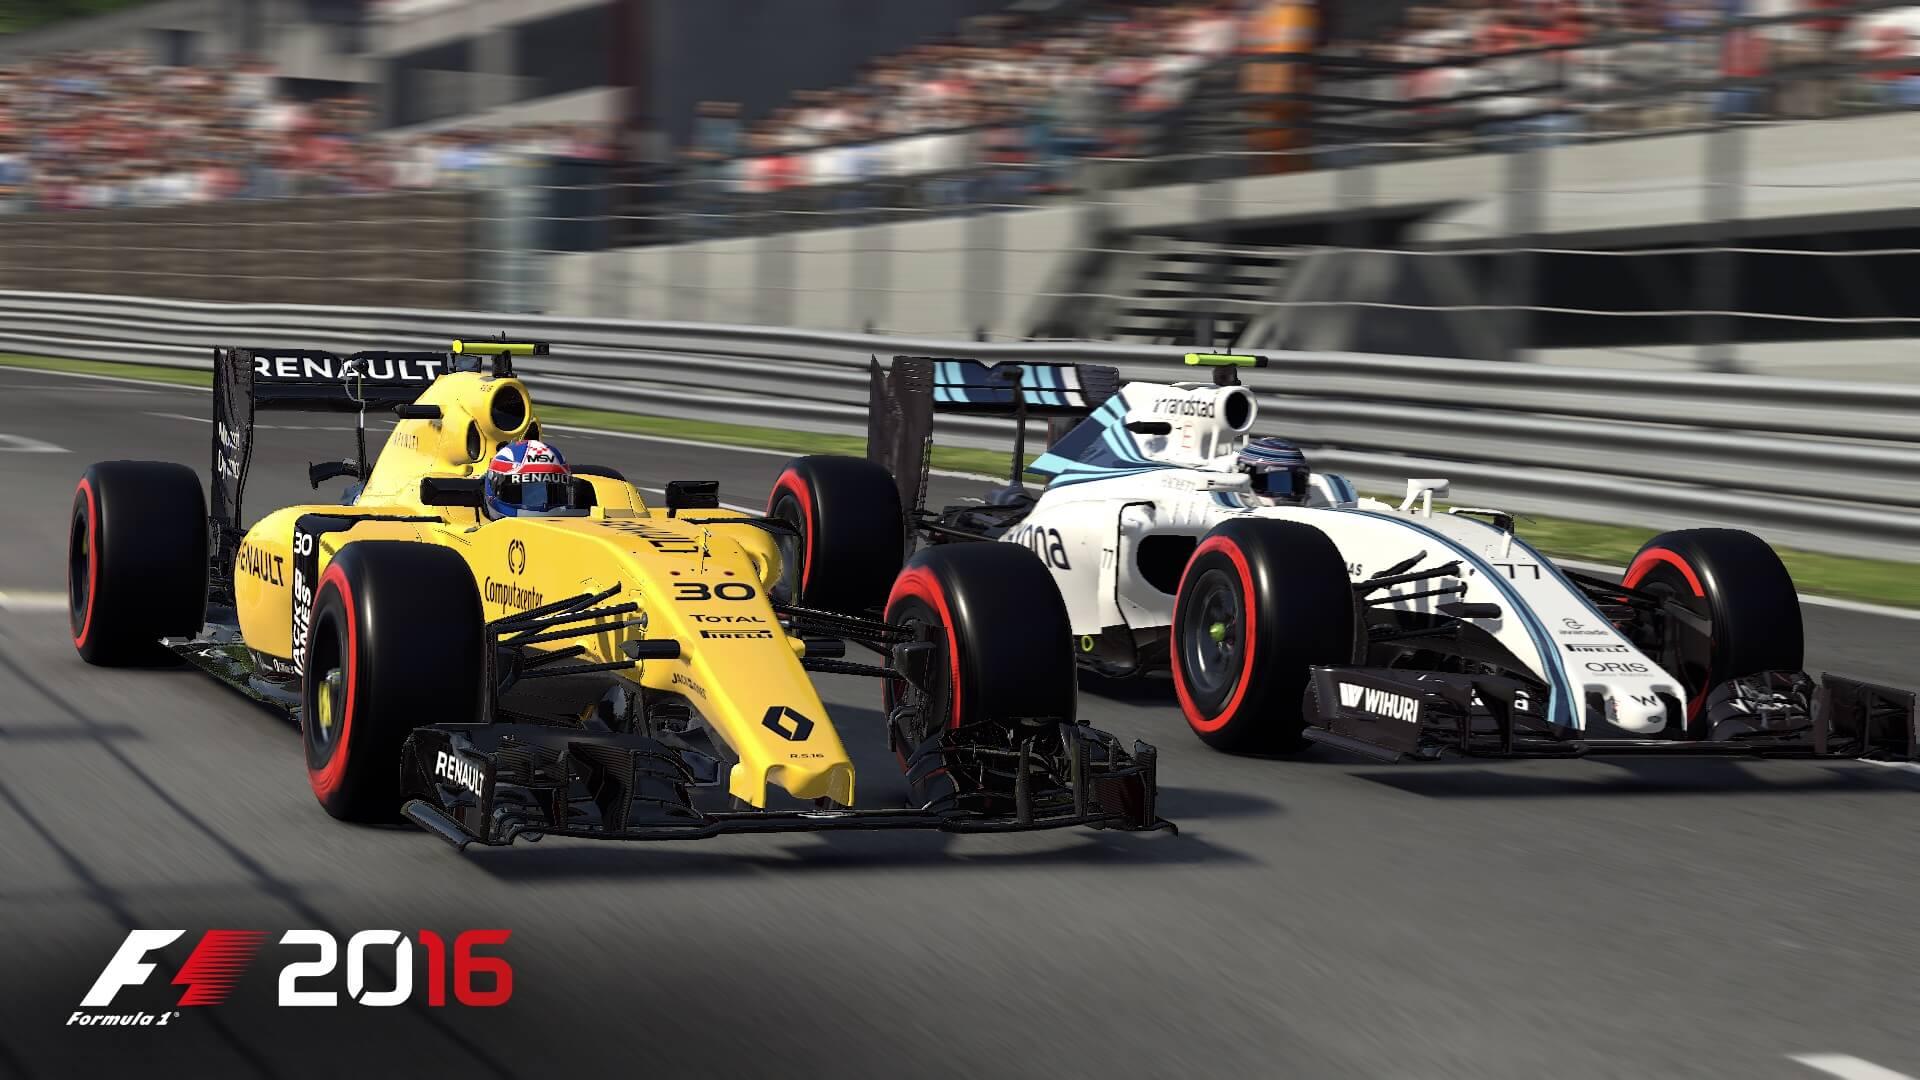 F1 2016: Kopf-an-Kopf-Rennen in Spa (Bildrechte: Feral Interactive)